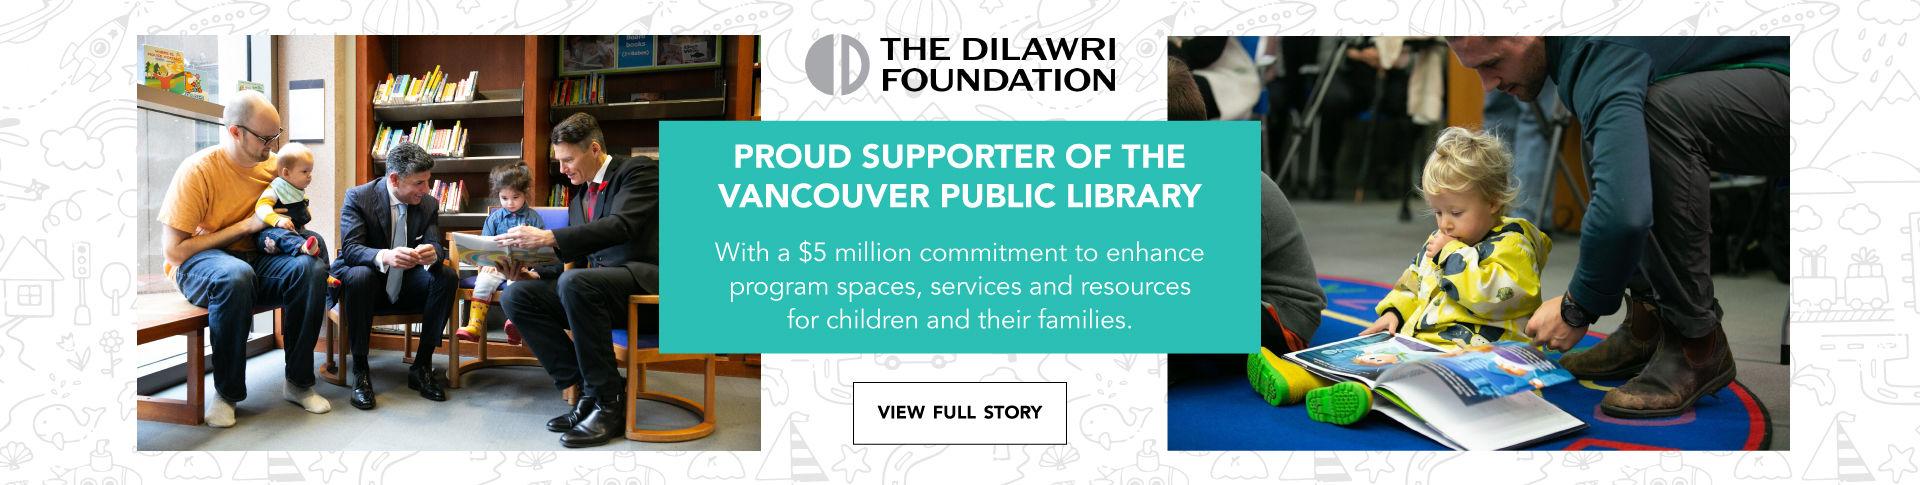 Dilawri Foundation Vancouver Public Library